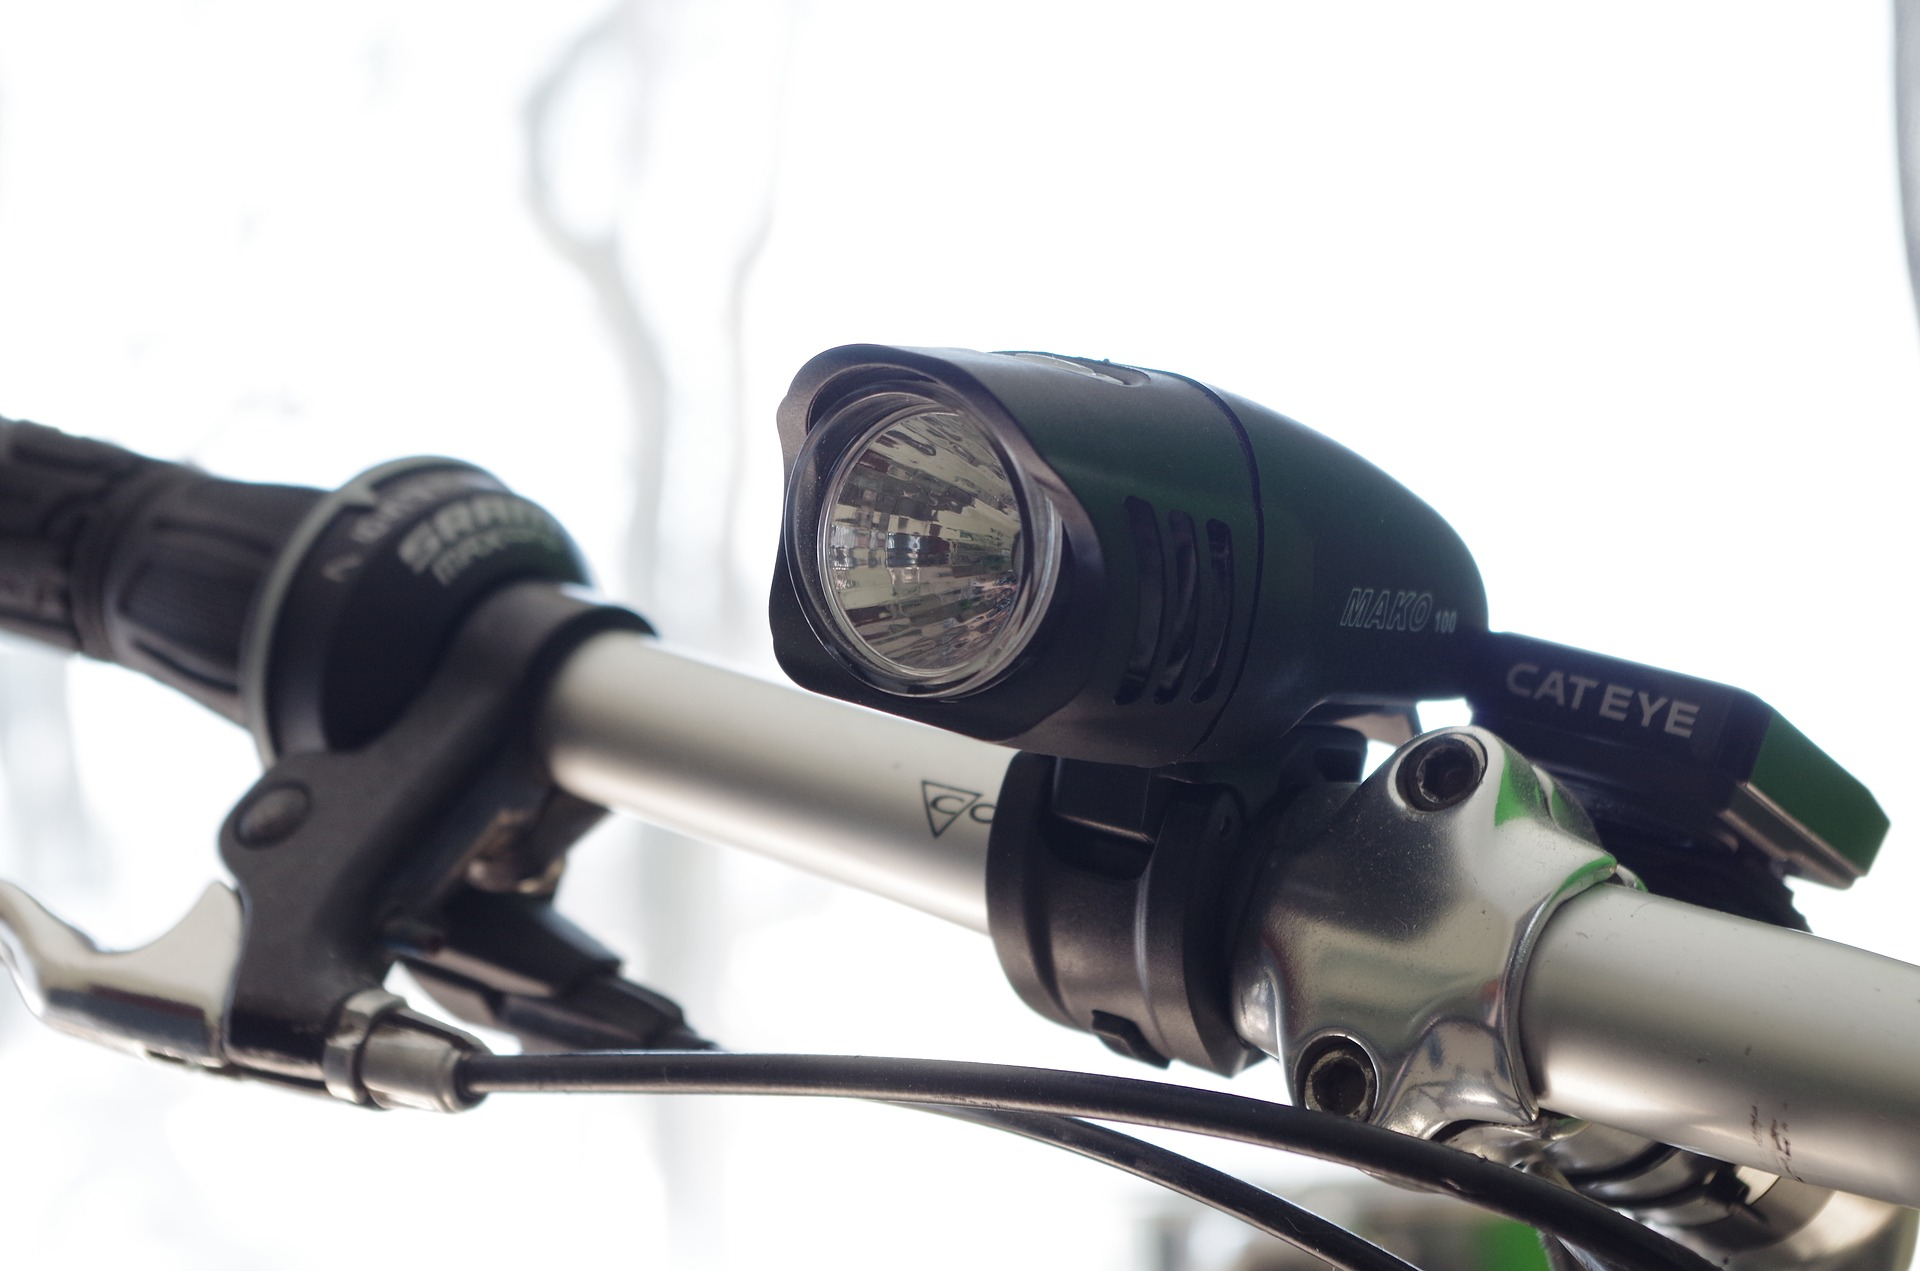 LED Fahrradlampe: Test & Empfehlungen (05/21)